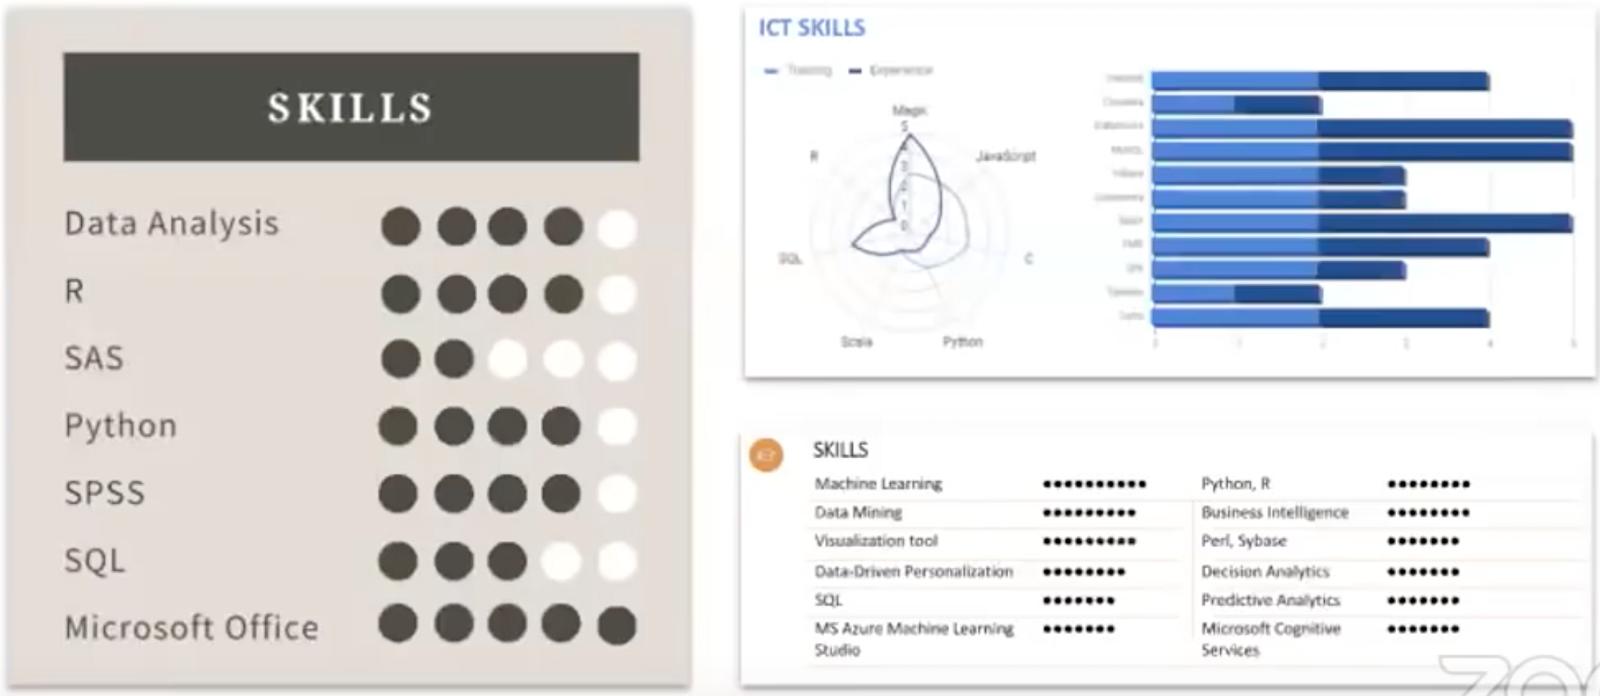 How To Build A Data Science Portfolio Data Science Data Scientist Data Analyst